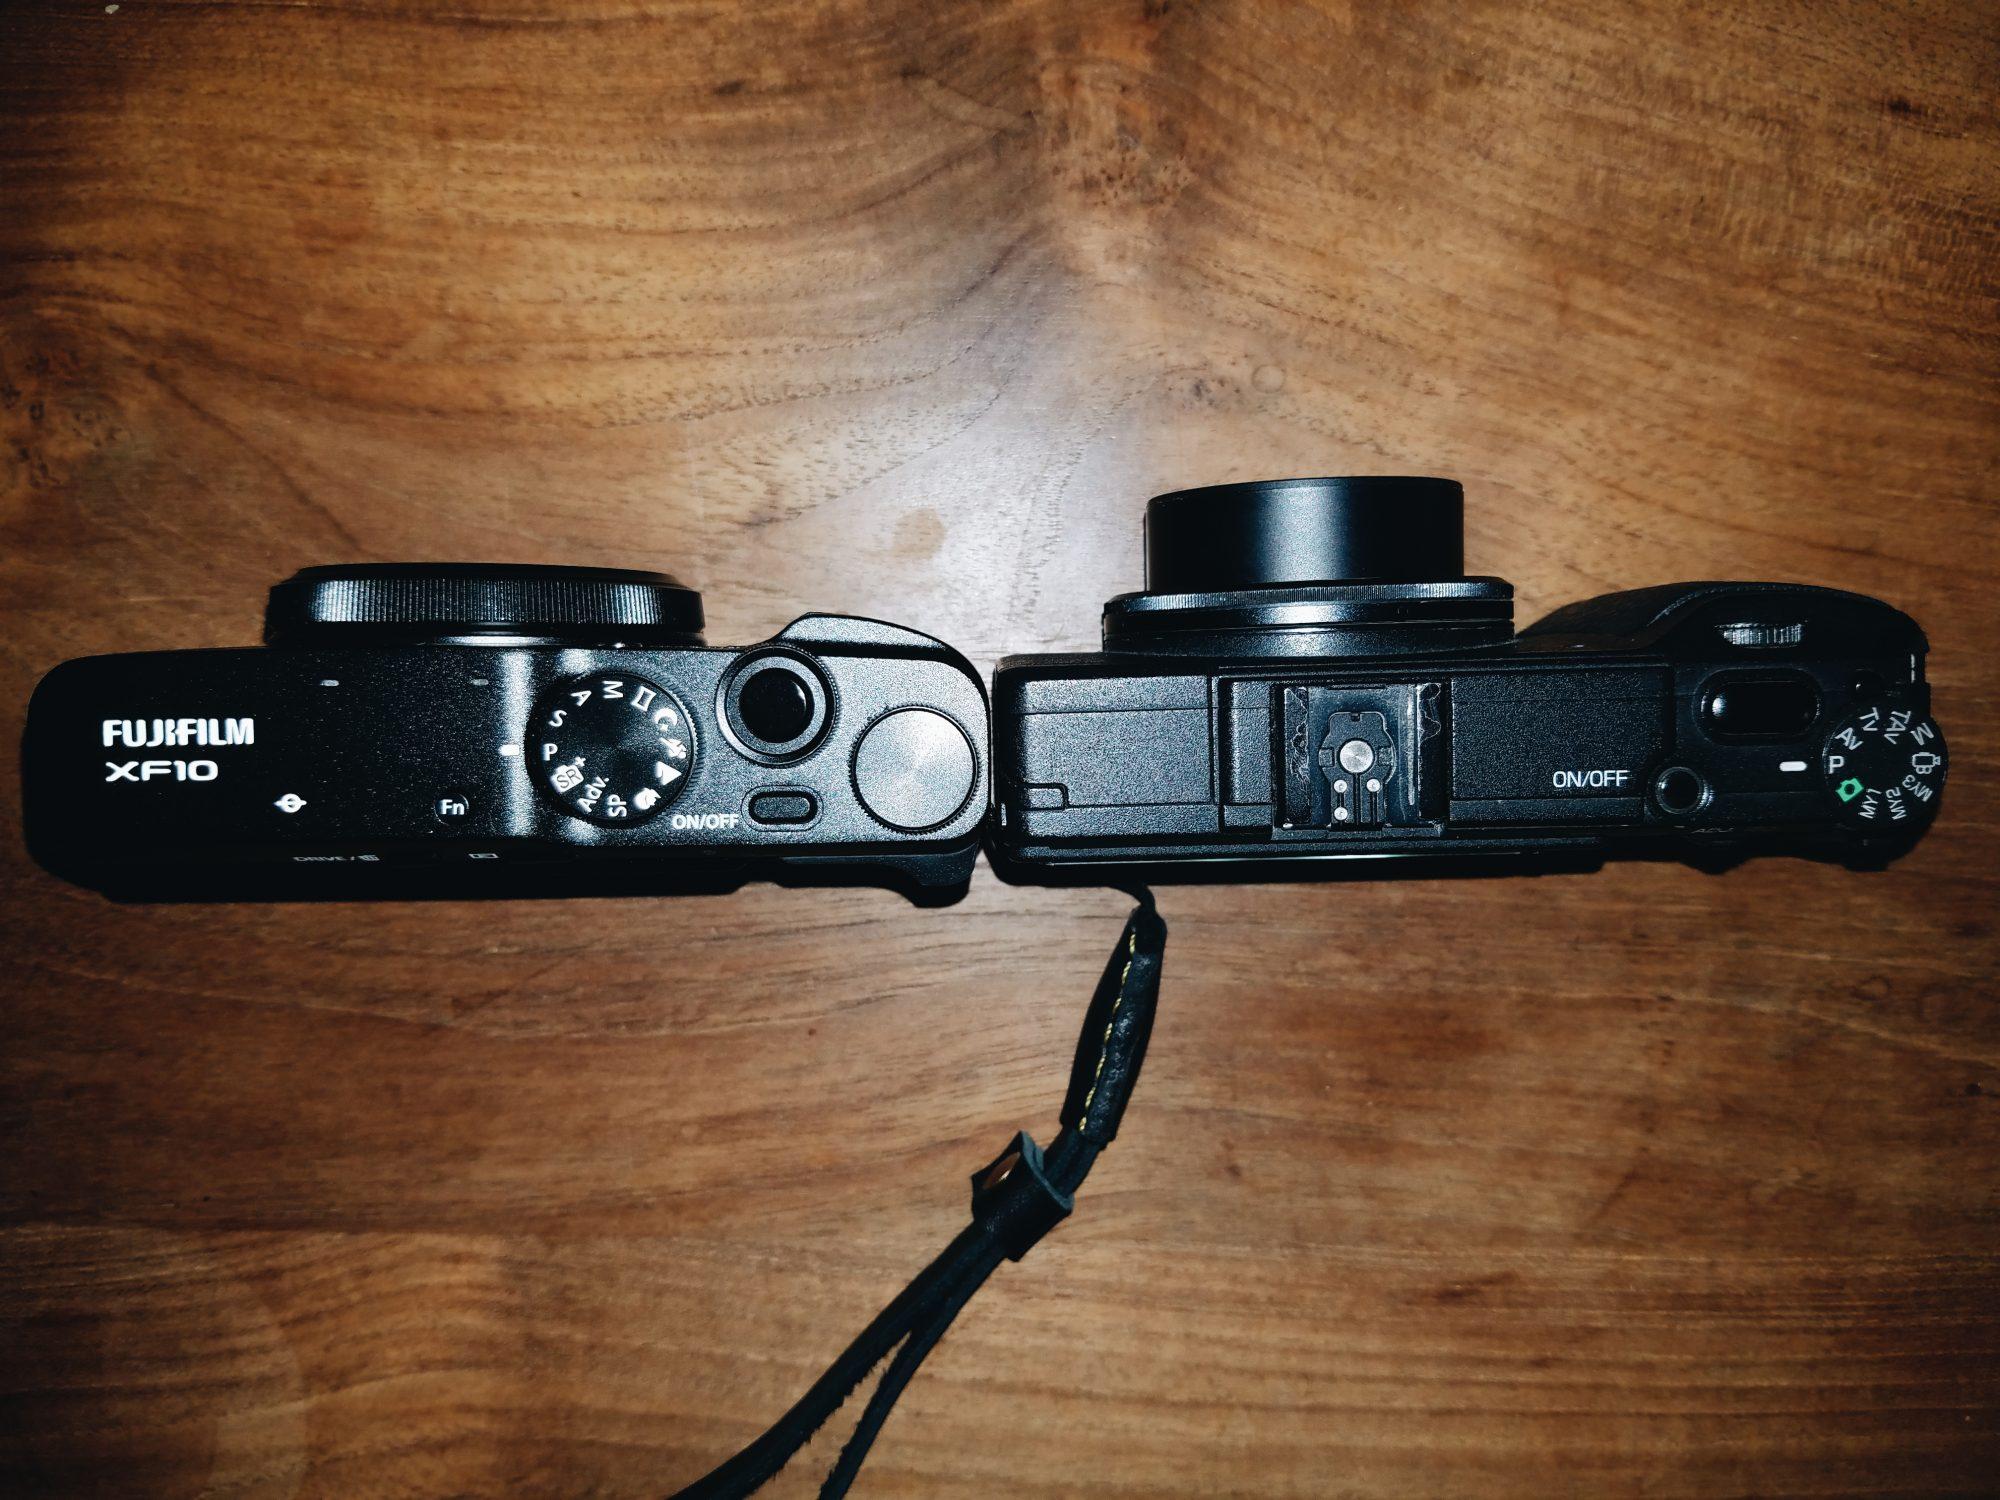 Fujifilm XF10 vs Ricoh GR II Review